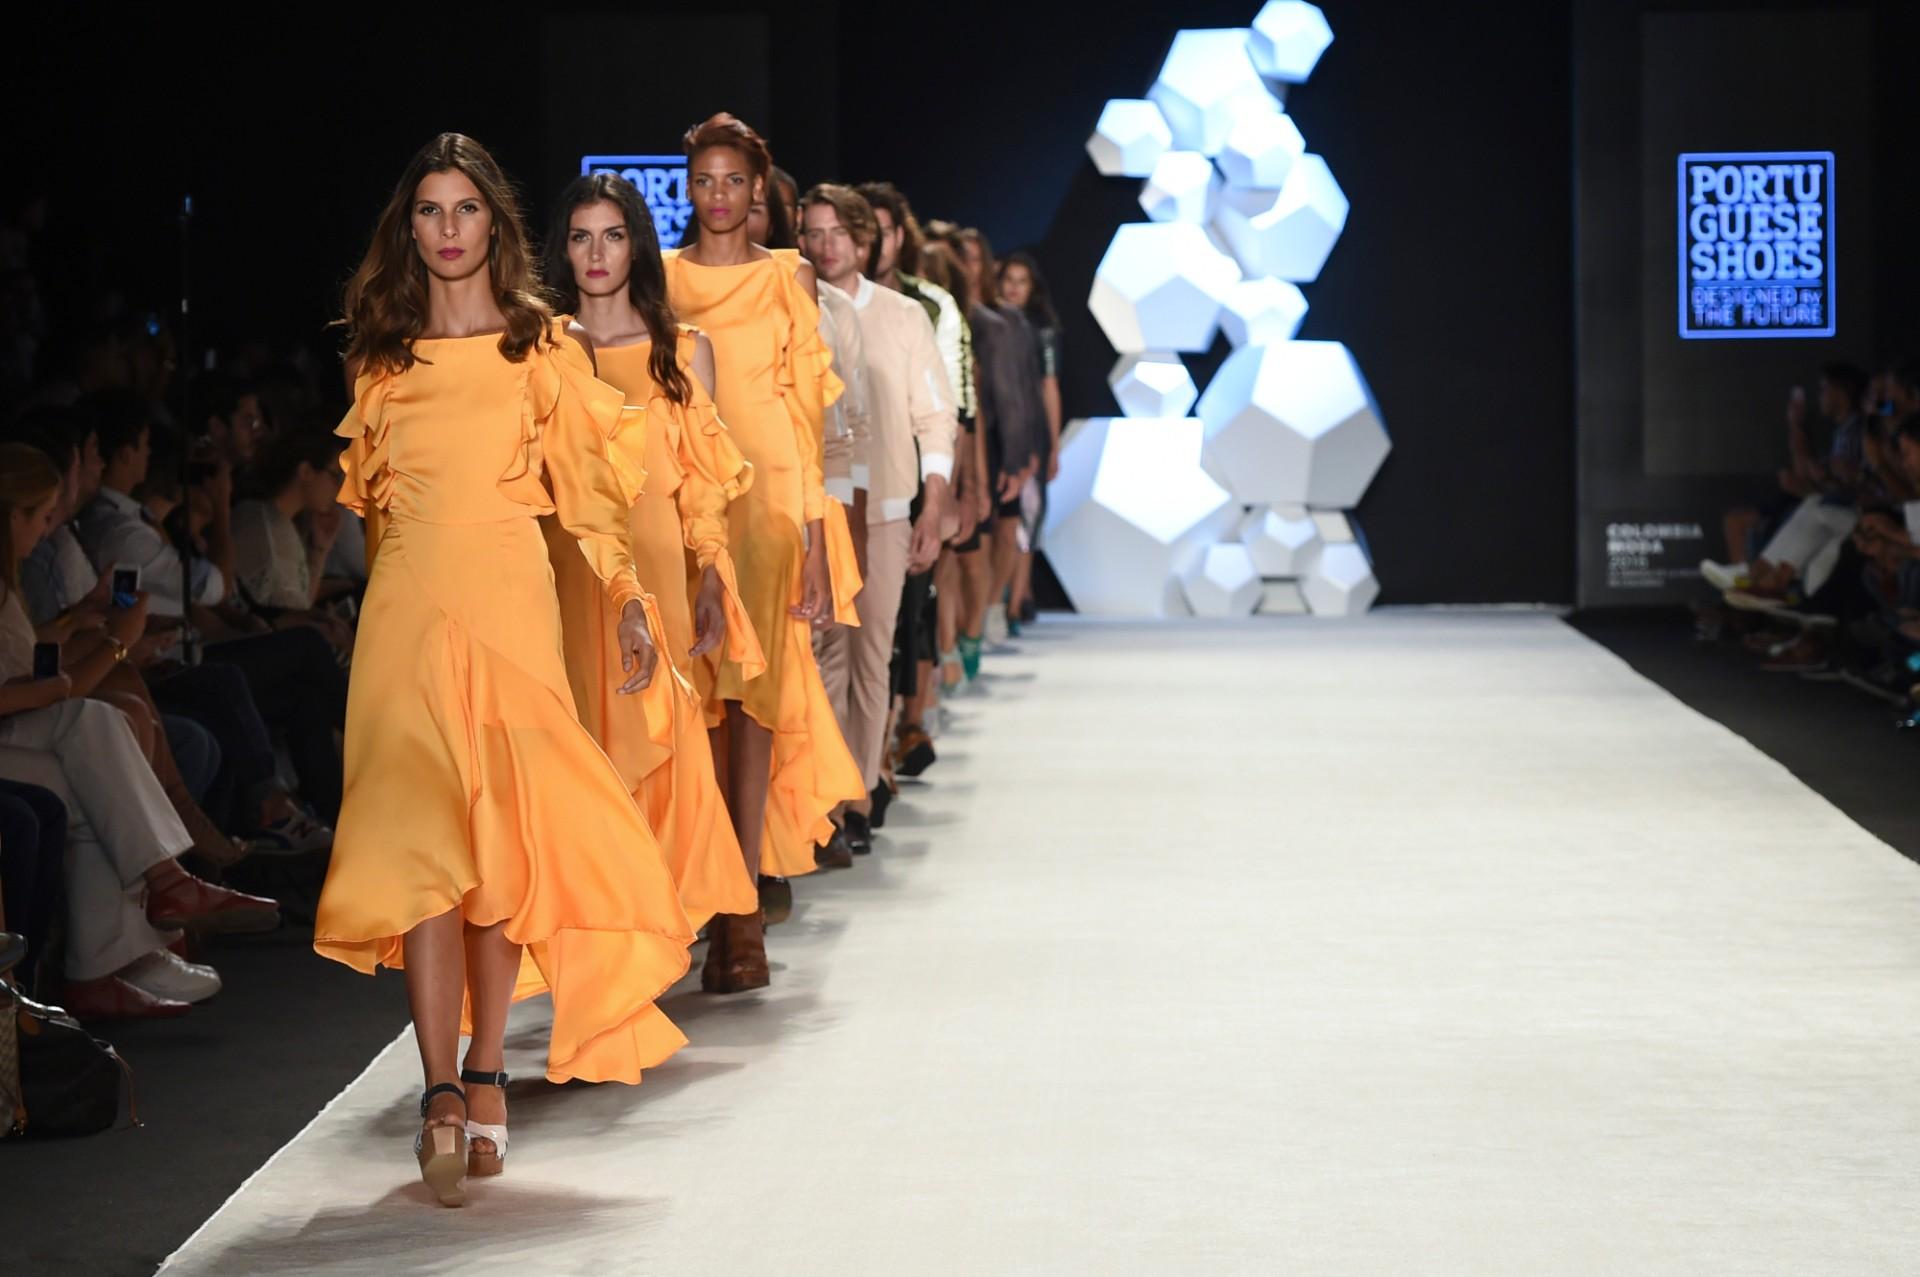 Portuguese Fashion Designers Sell Clothing Pieces To Help Mozambique portuguese fashion designers Portuguese Fashion Designers Sell Clothing Pieces To Help Mozambique 20161849p